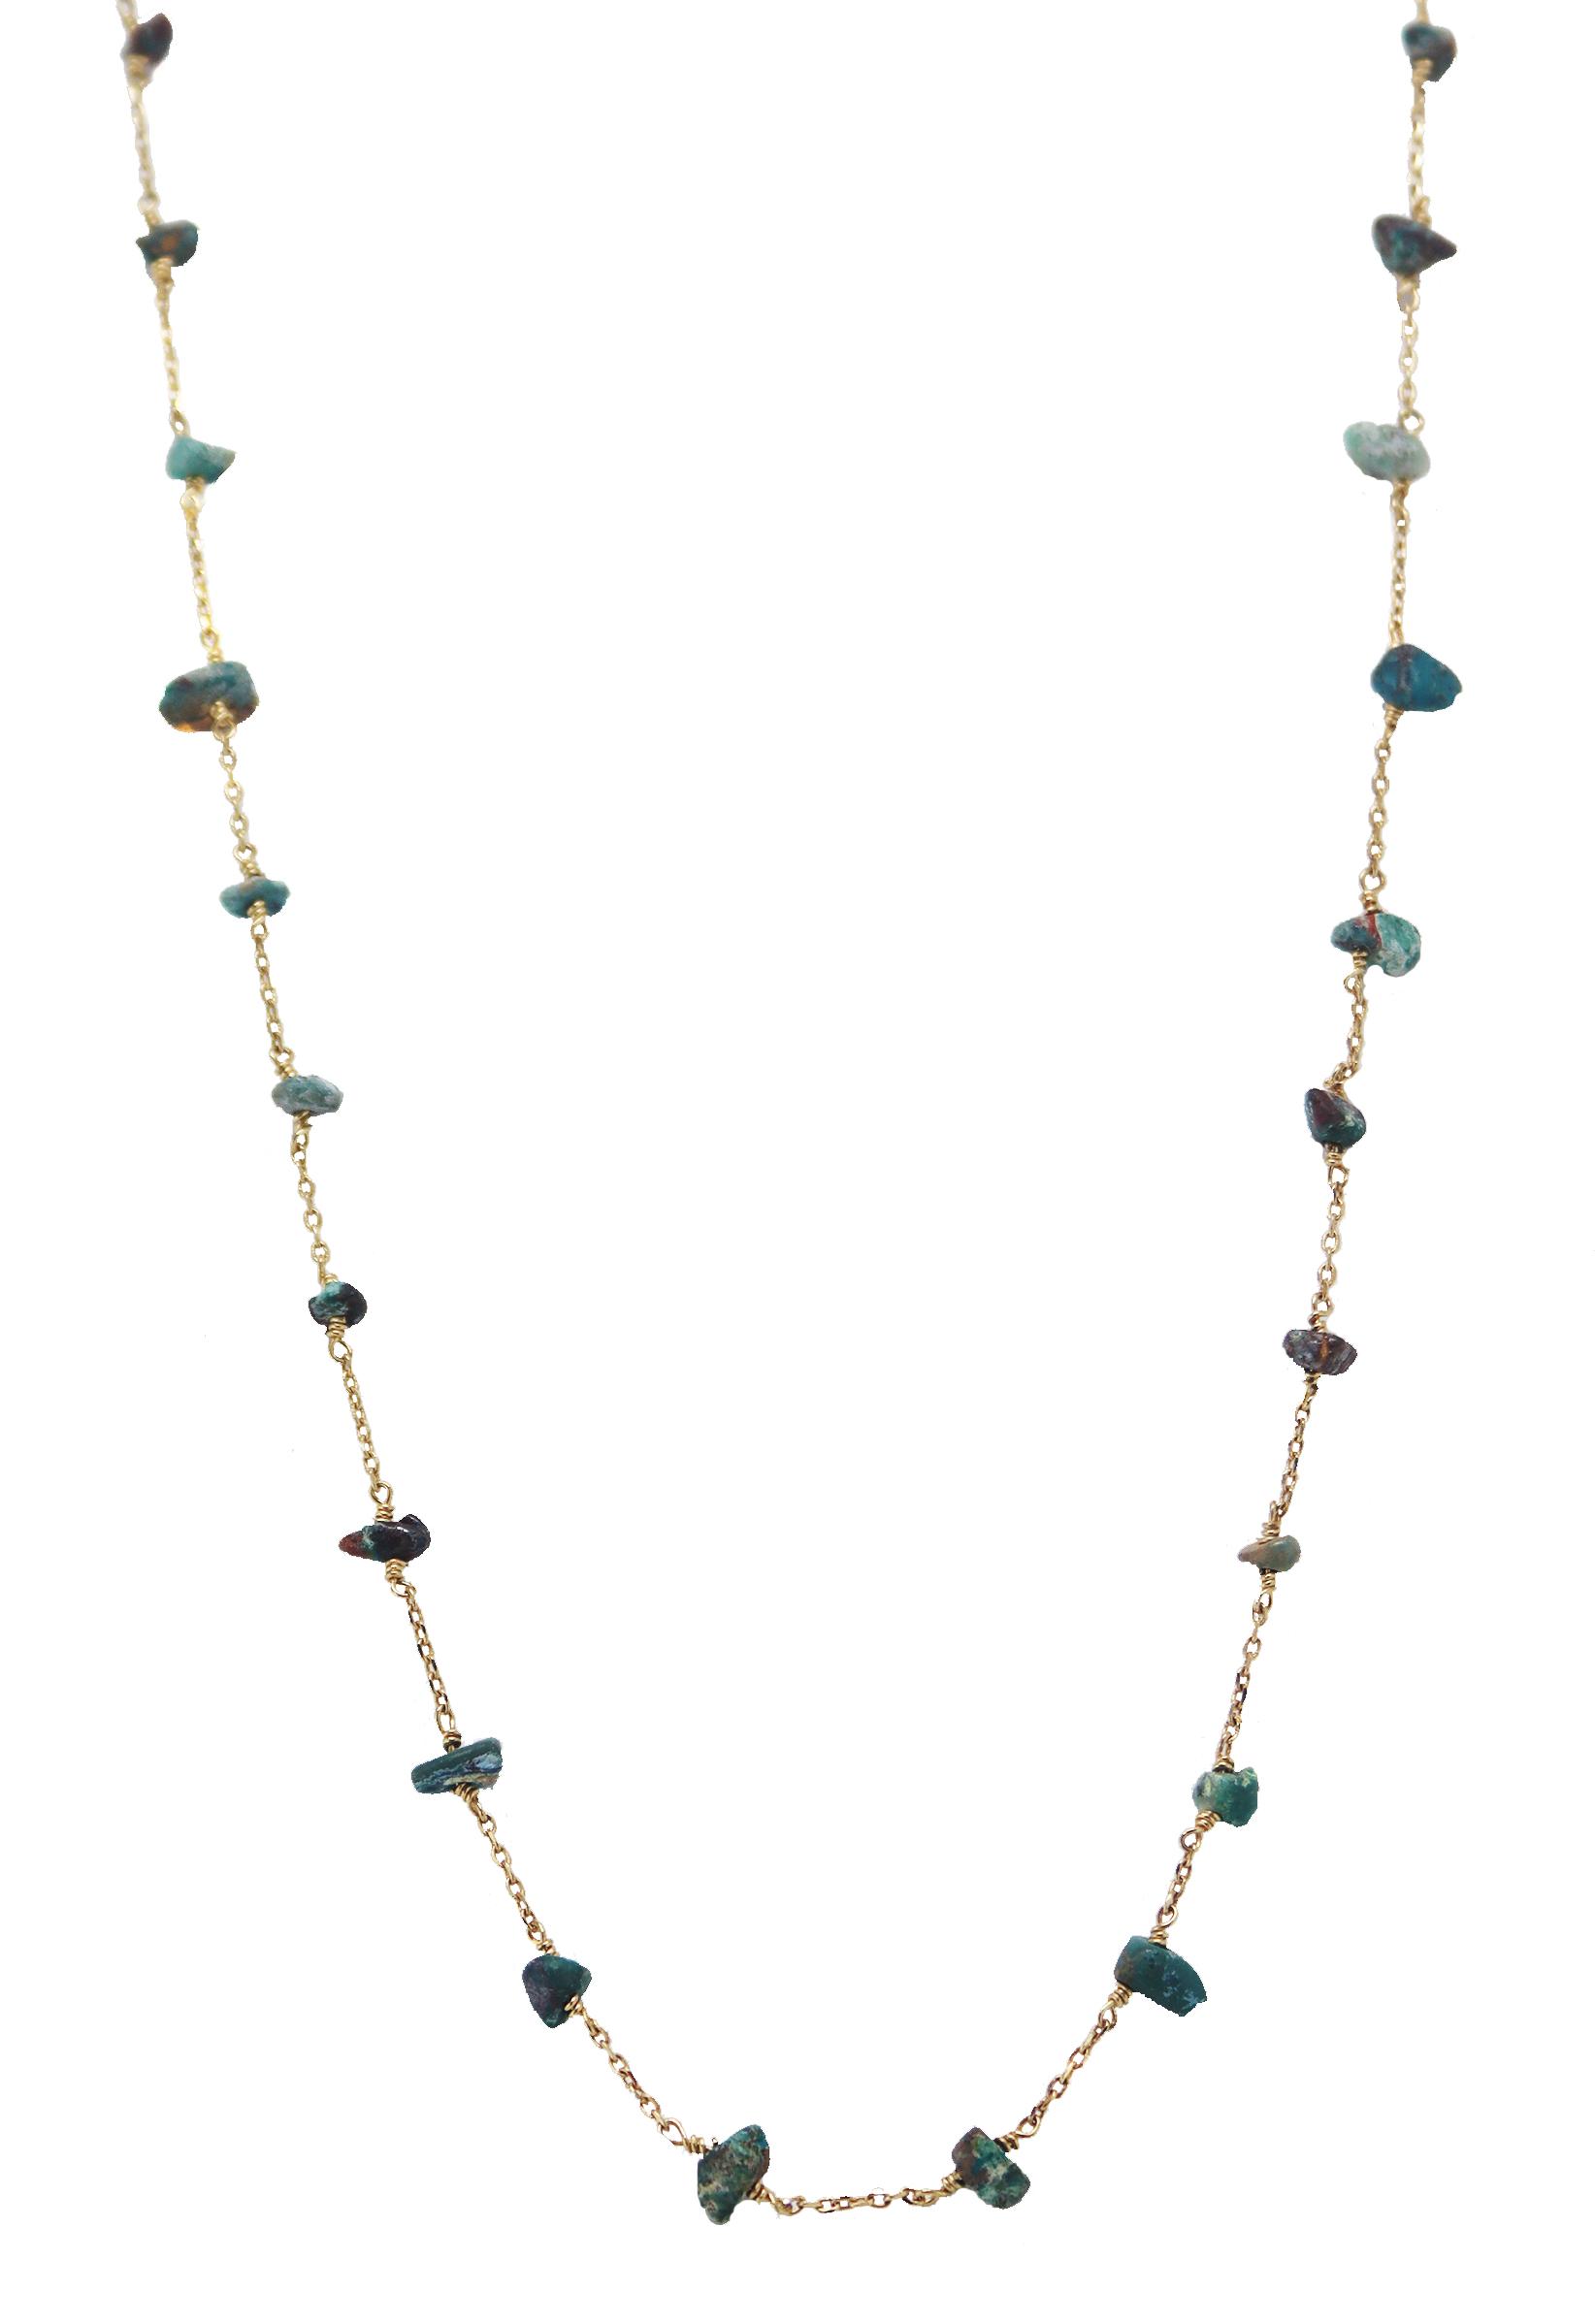 CO-HI-02218-42cm-CHRYSOCOLLE